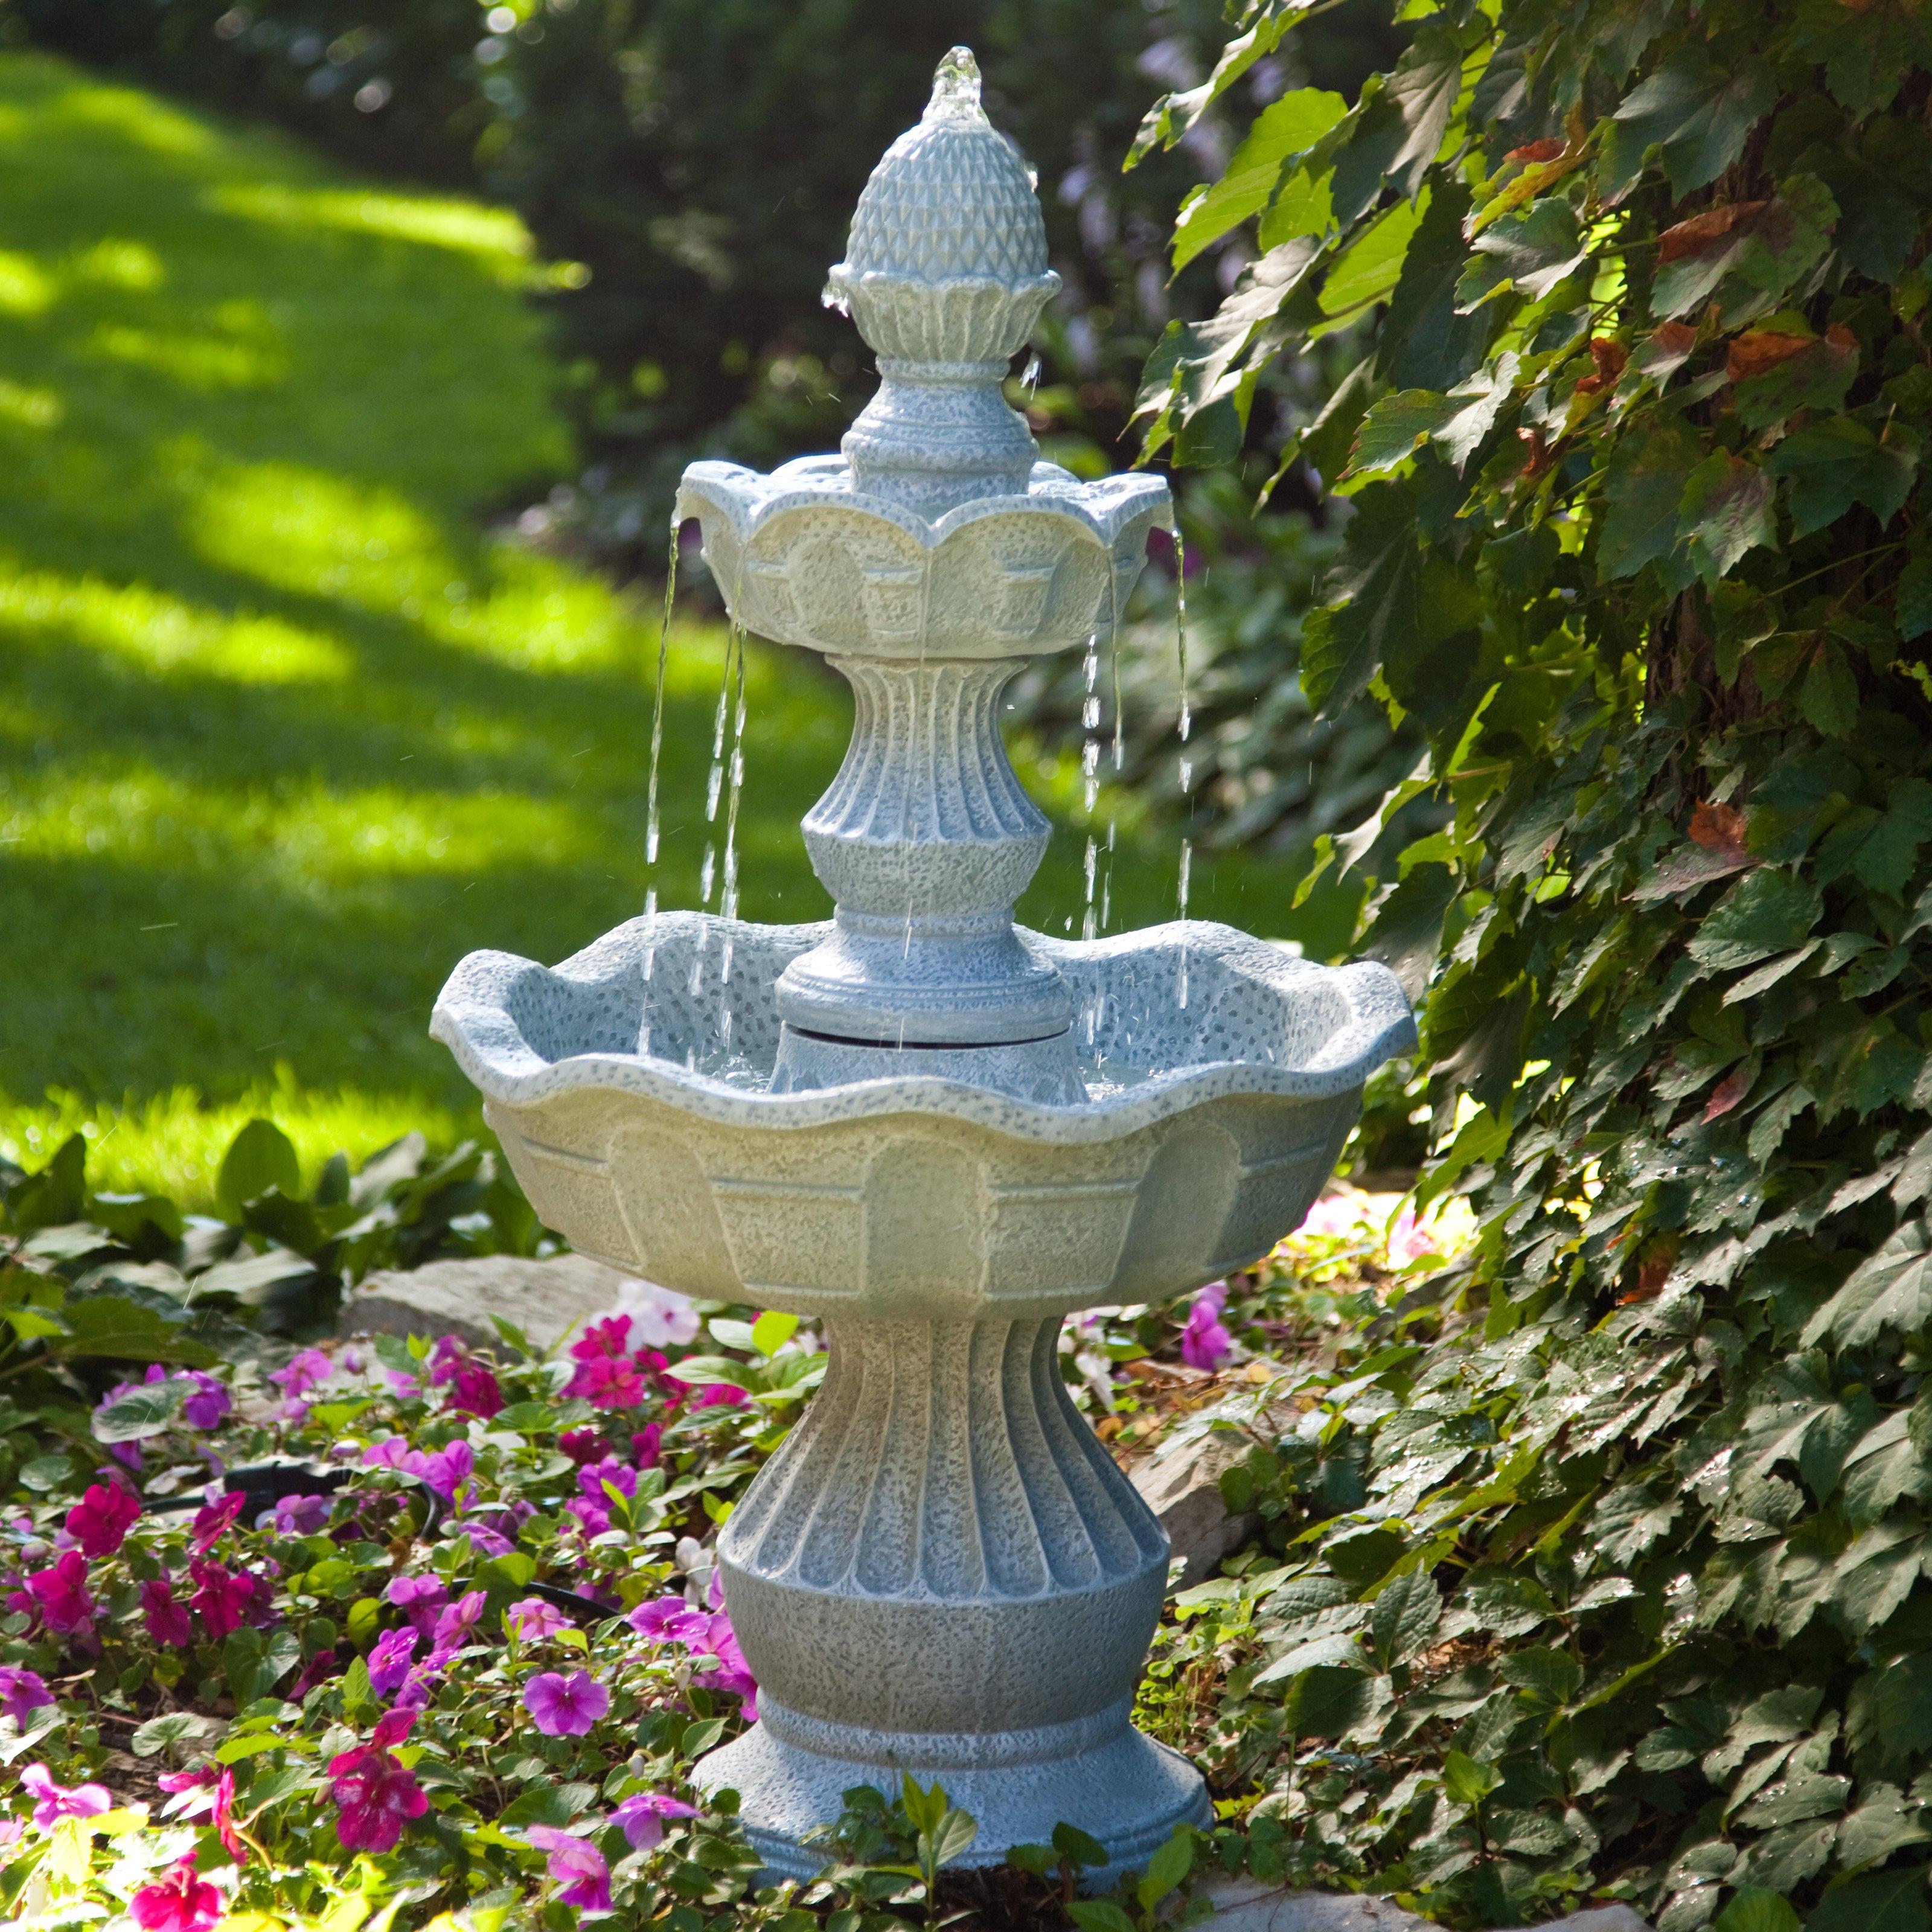 garden fountains welcome garden pineapple tiered outdoor fountain | hayneedle NXLIPEO